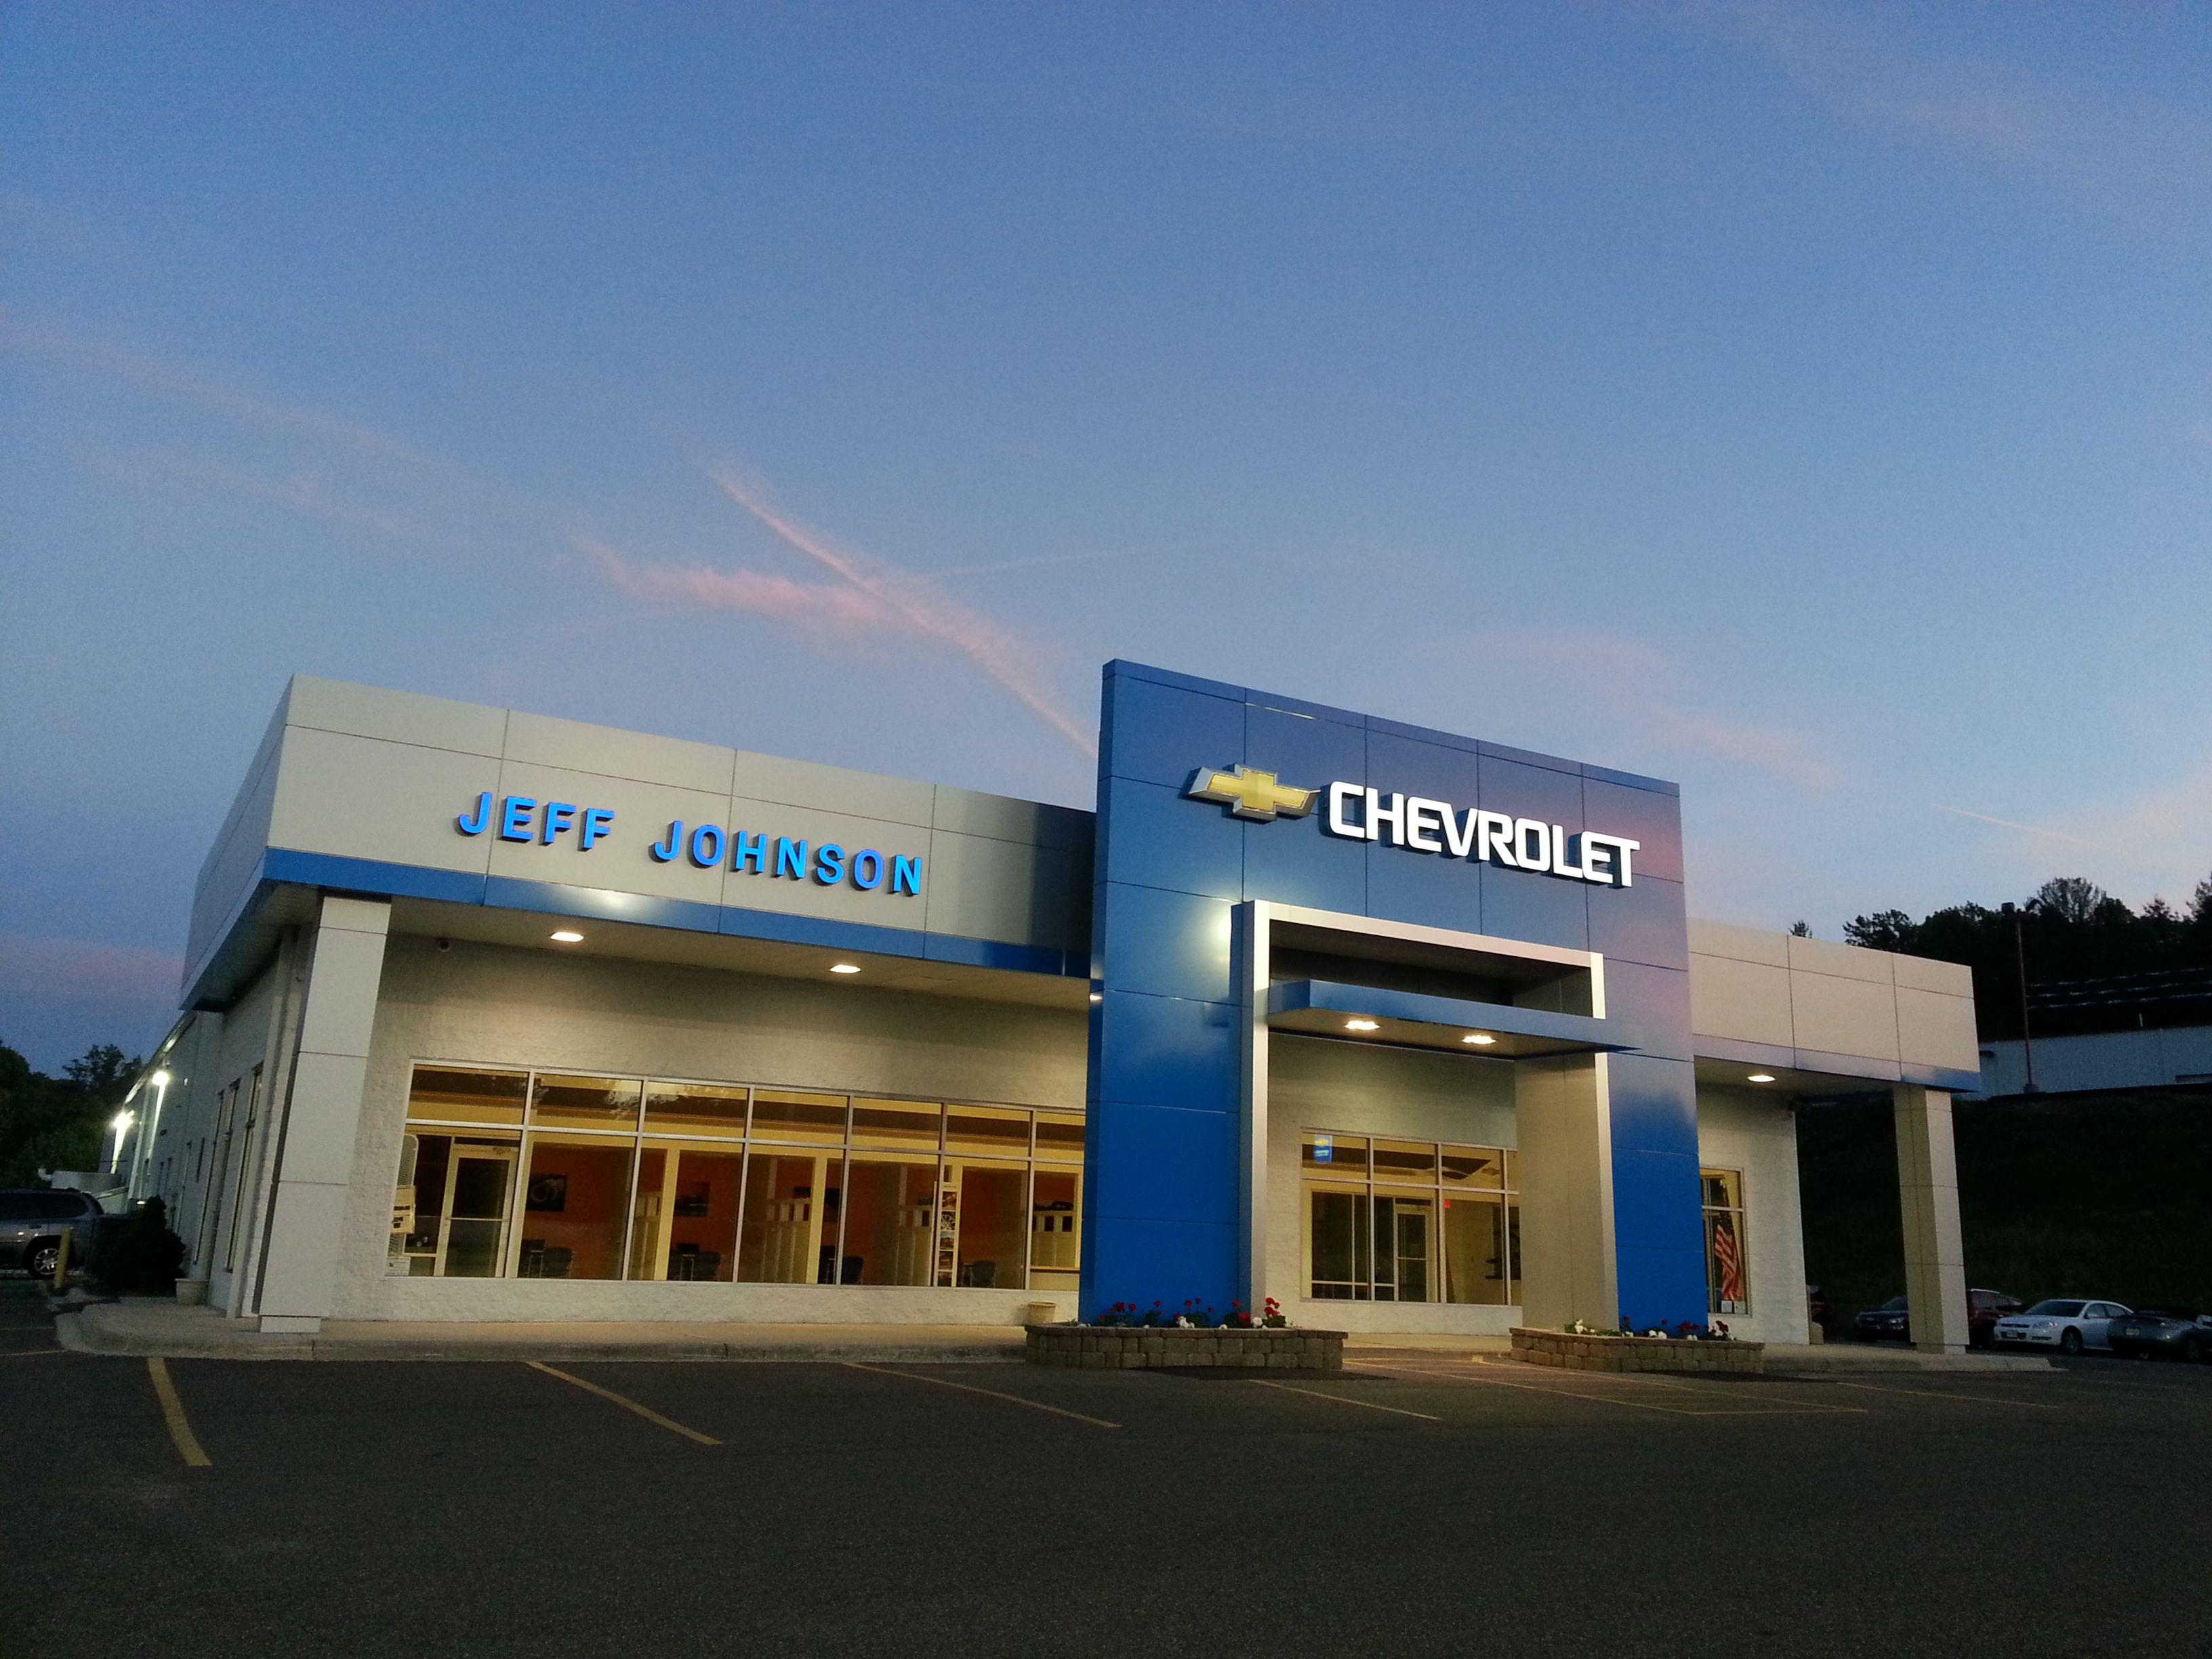 Woodlawn Virginia Jeff Johnson Chevrolet Dealership Woodlawn Chevrolet Dealership Projects